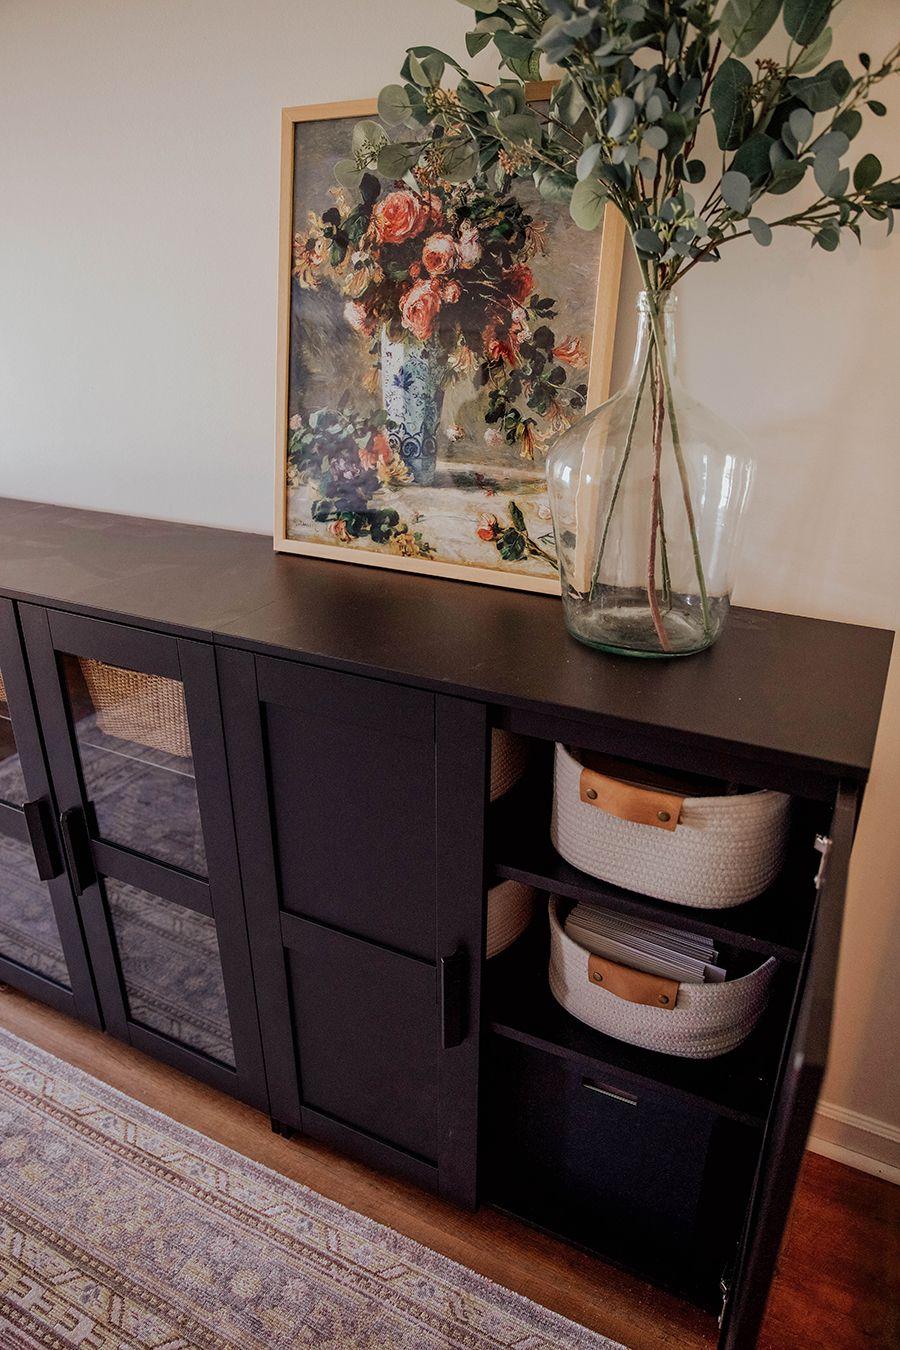 playroomtoy storage ikea brimnes cabinets  ikea